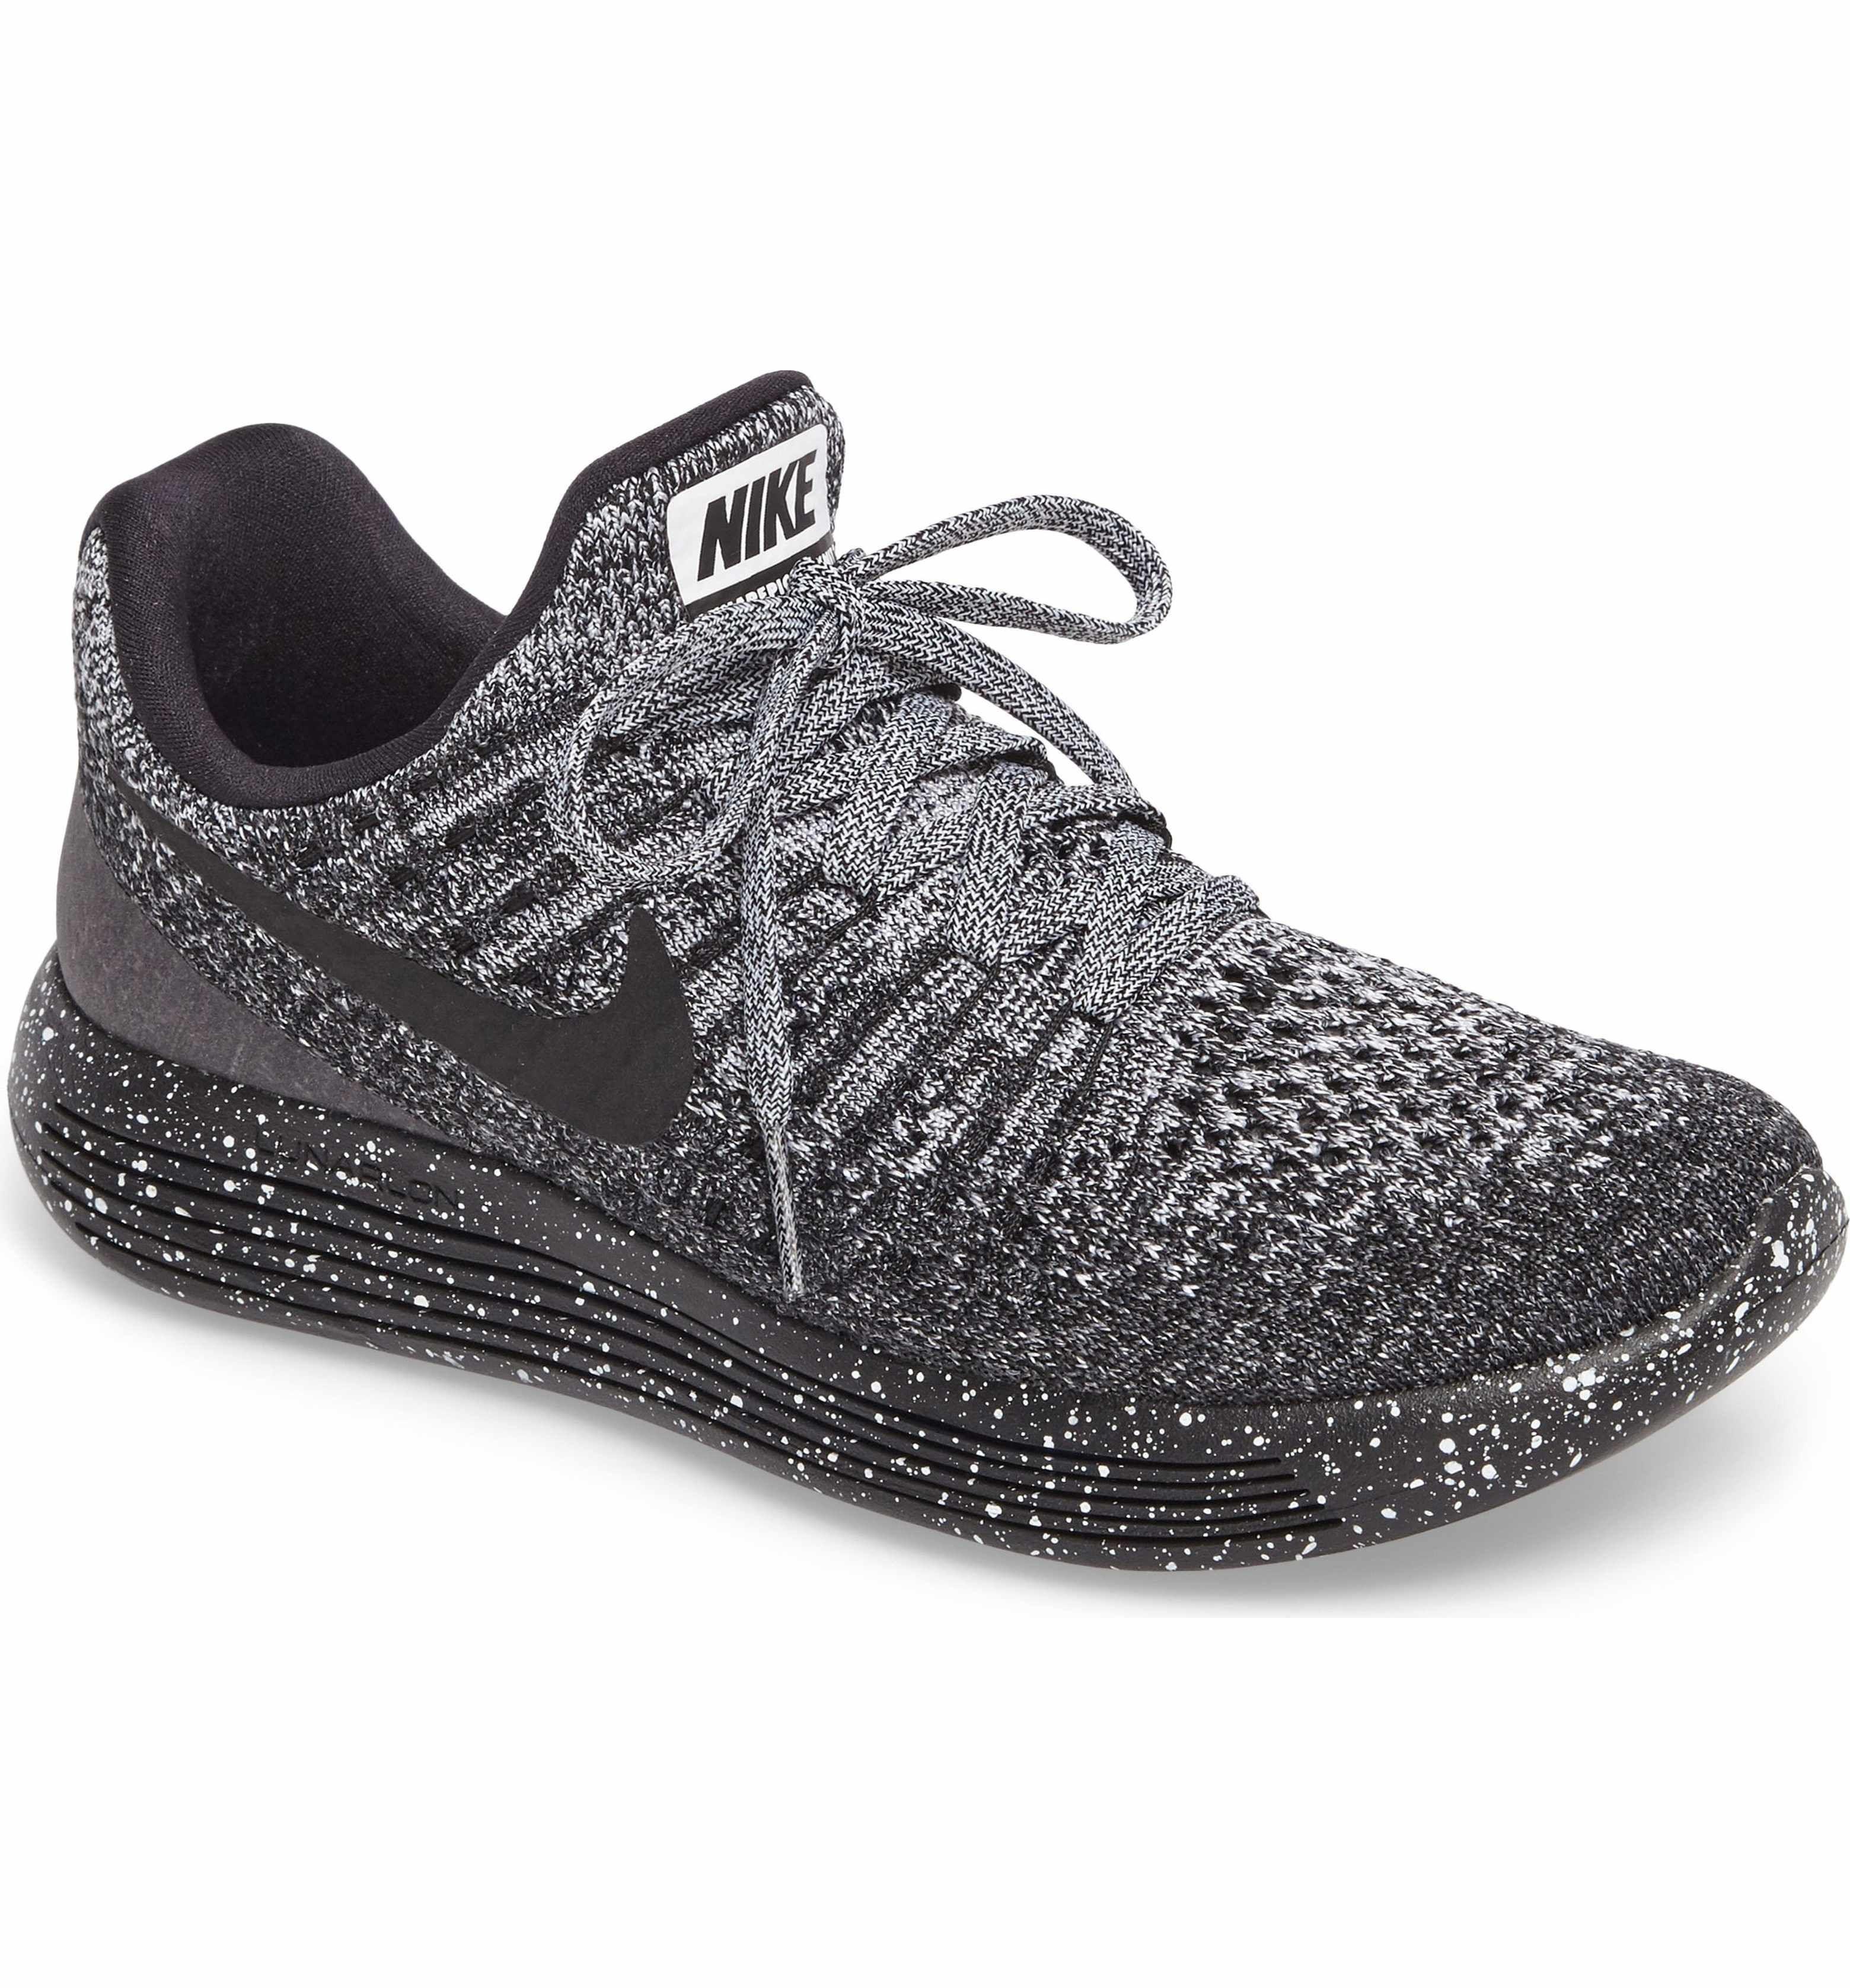 Nike Lunarepic Low Flyknit 2 Running Shoe Women Training Shoes Running Shoes Nike Women